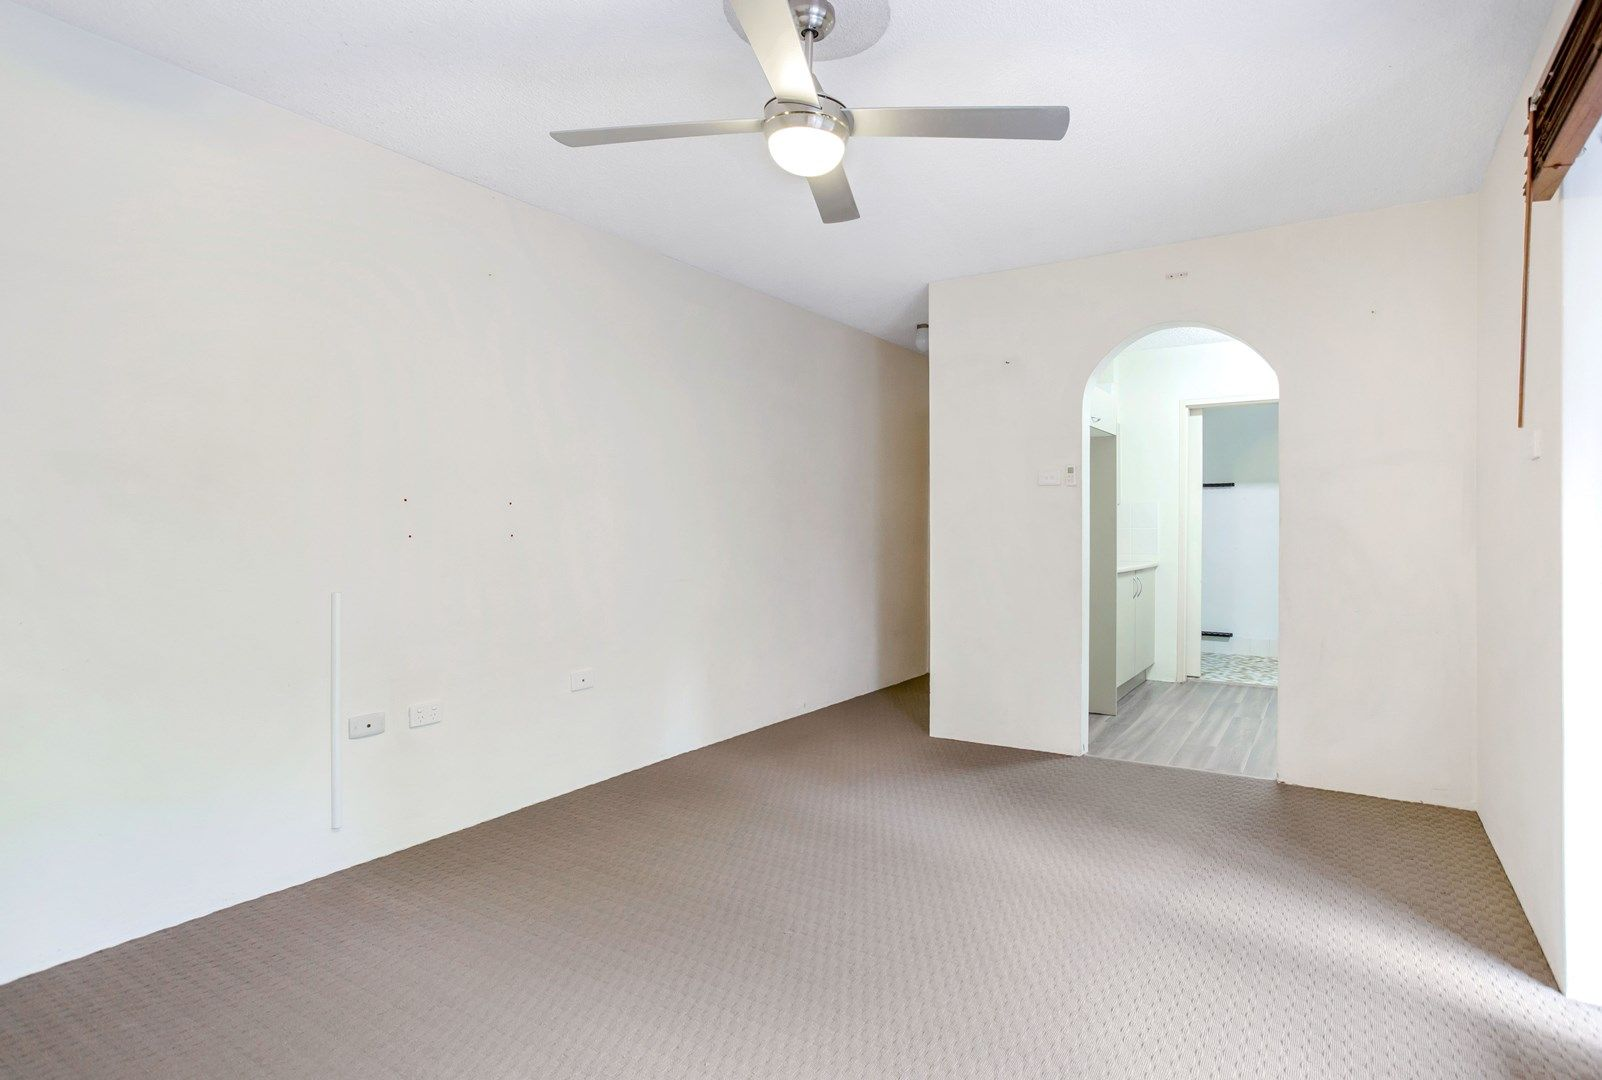 2/8 Messines Street, Shoal Bay NSW 2315, Image 0